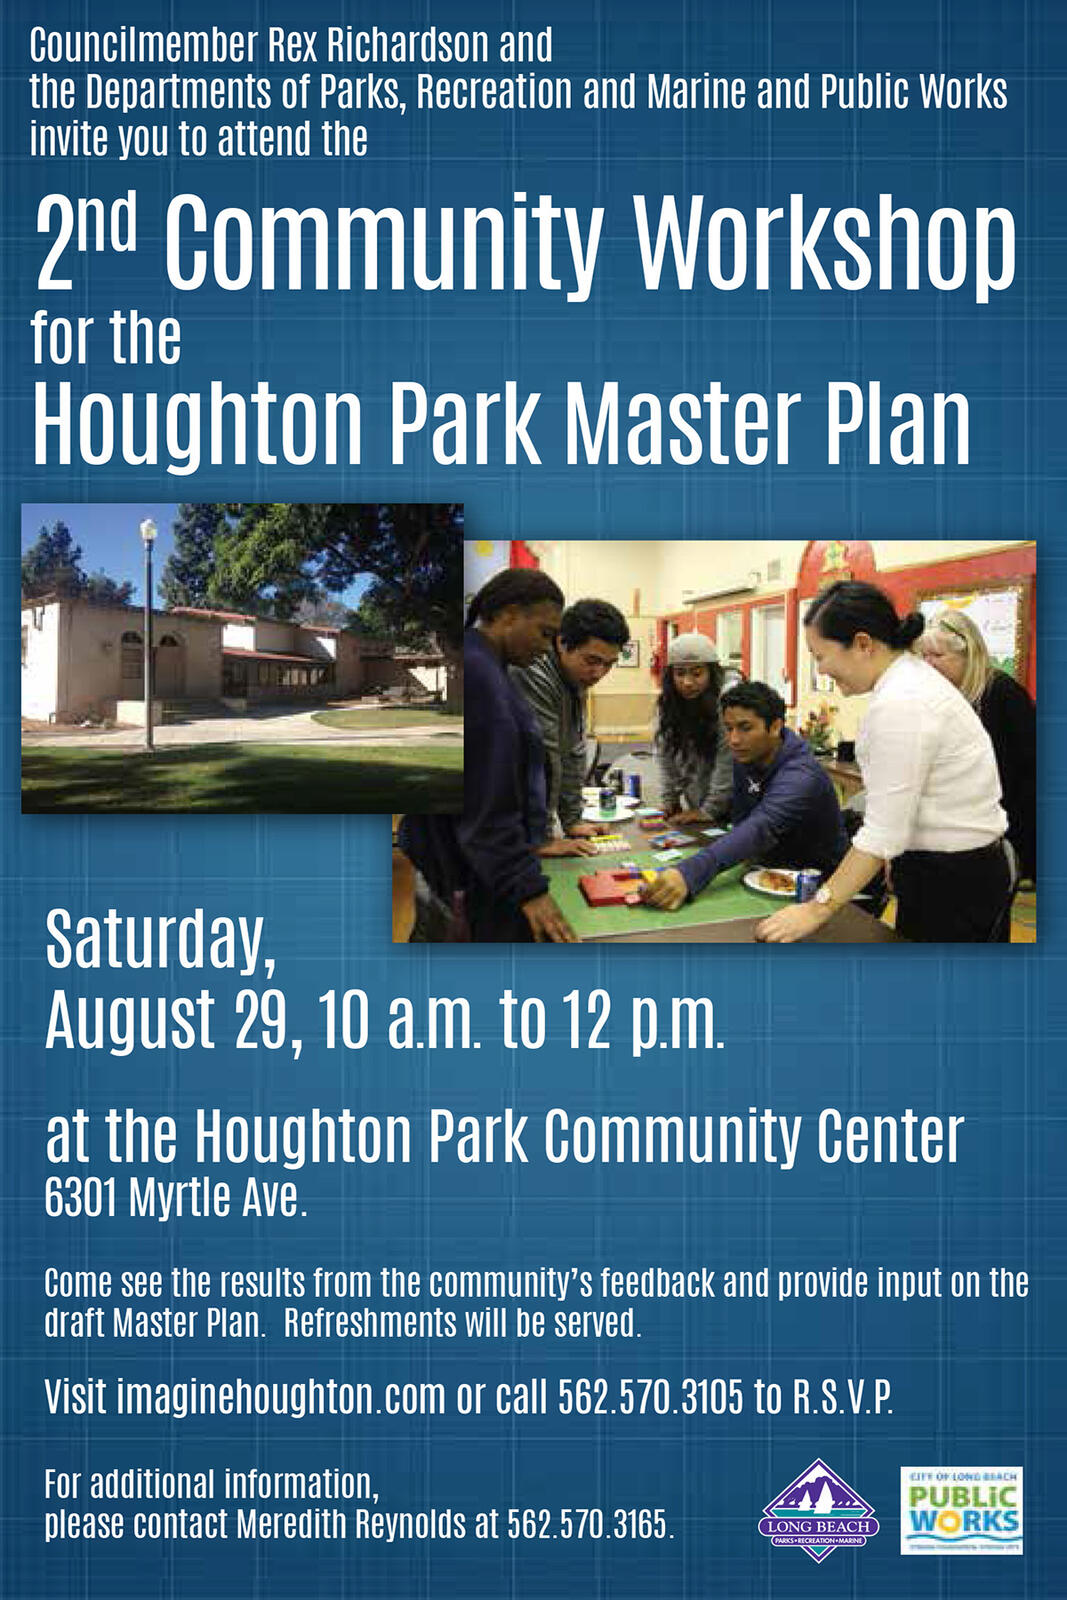 Second Community Workshop For Houghton Park Master Plan City Of Long Beach Mdash Nextdoor Nextdoor